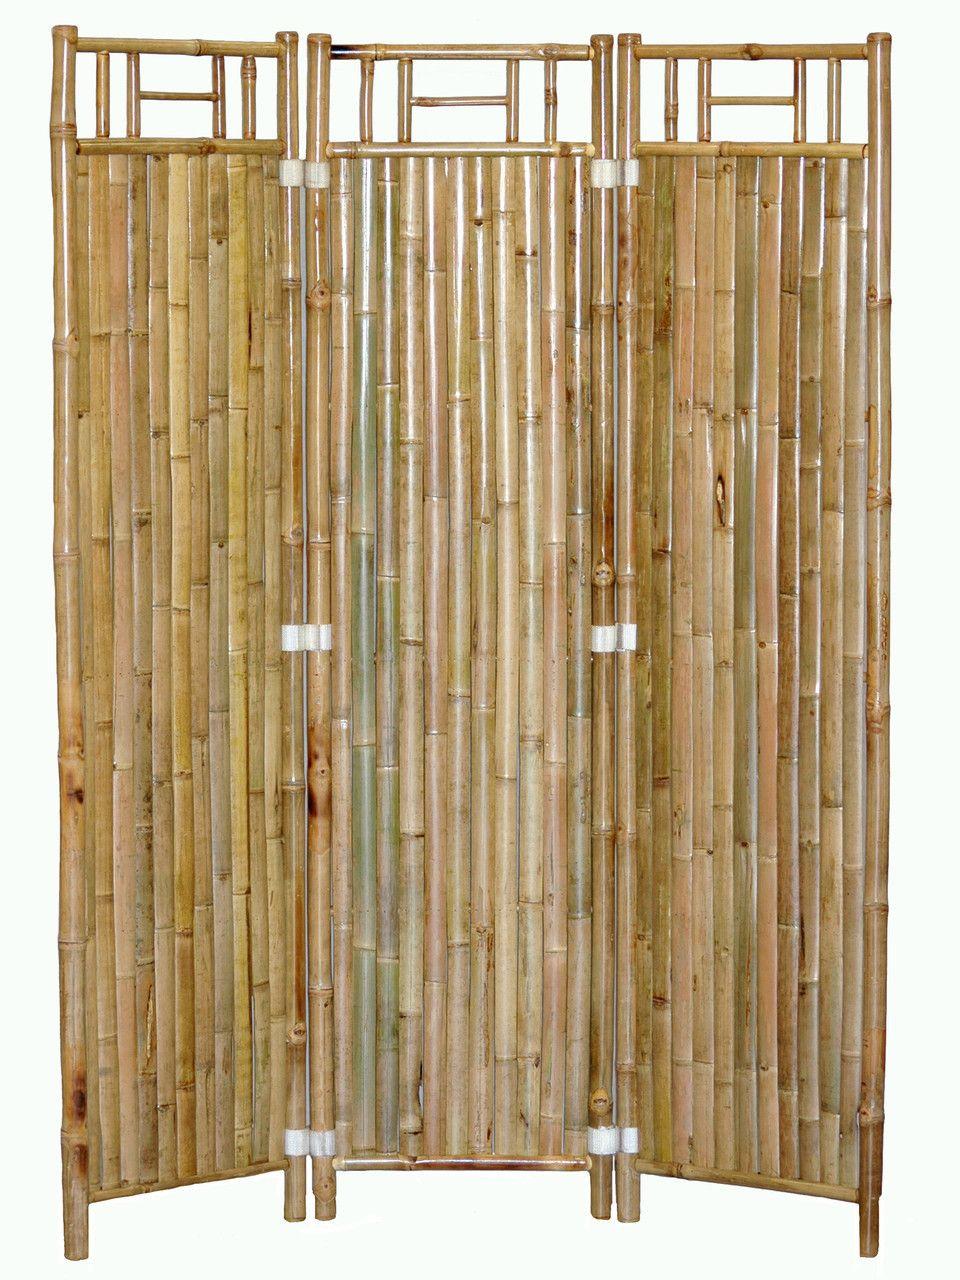 Panel bamboo room divider screen bamboo room divider room